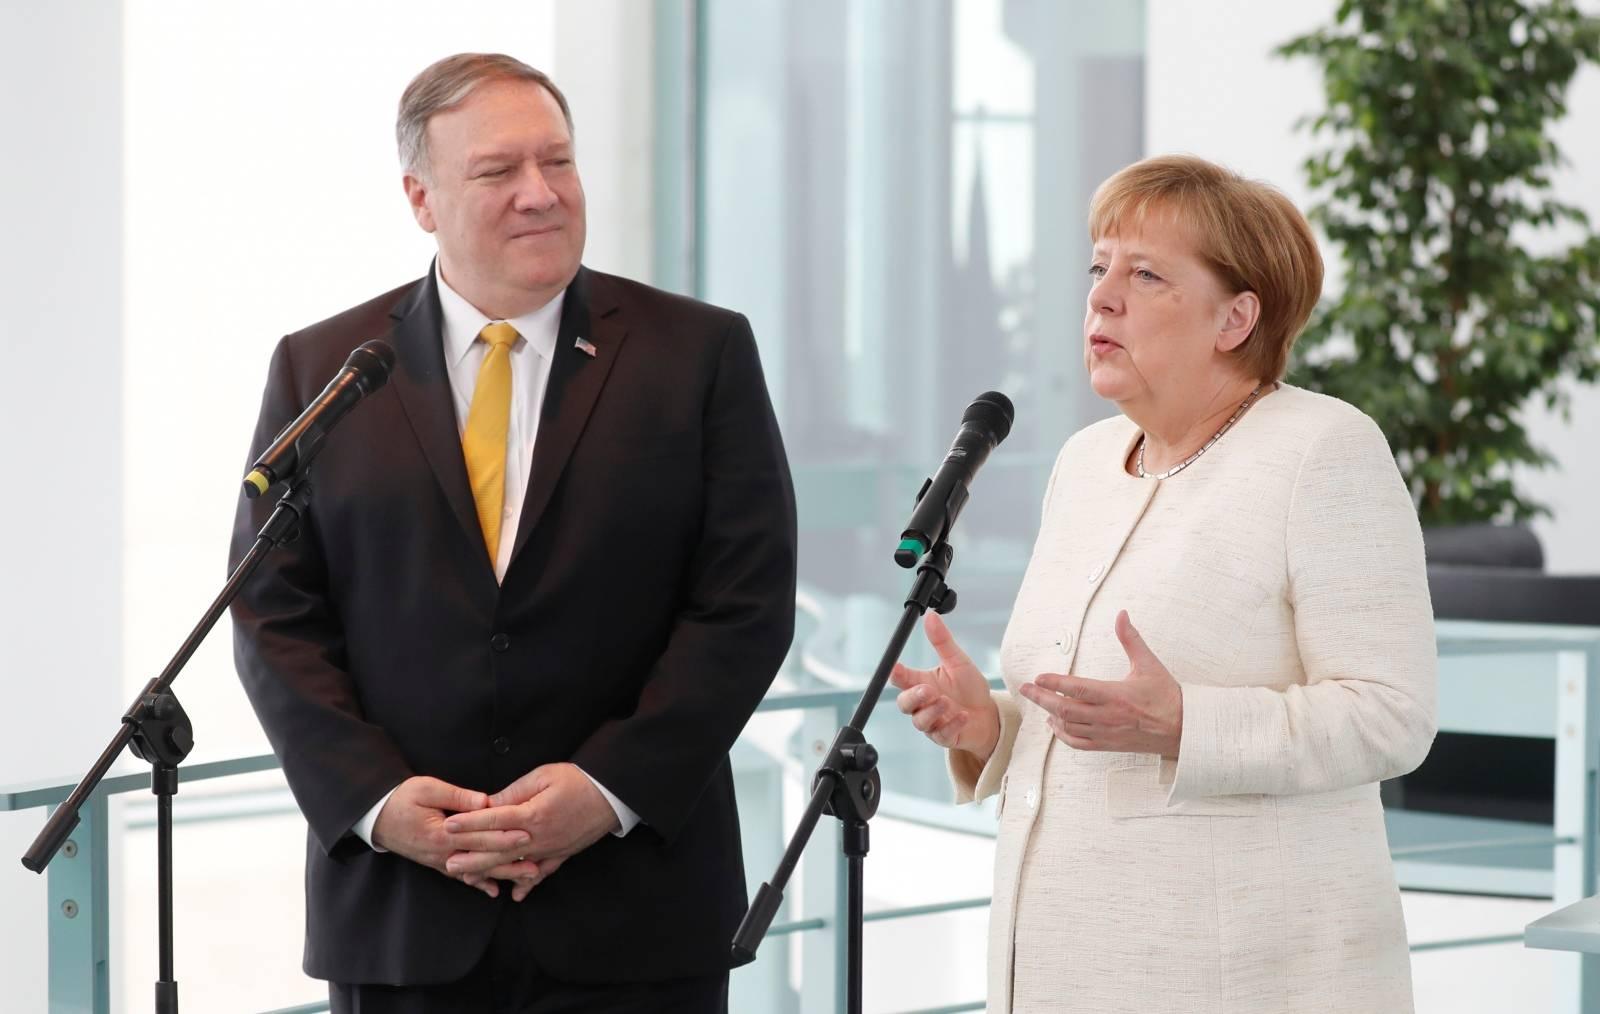 U.S. Secretary of State Mike Pompeo visits Germany